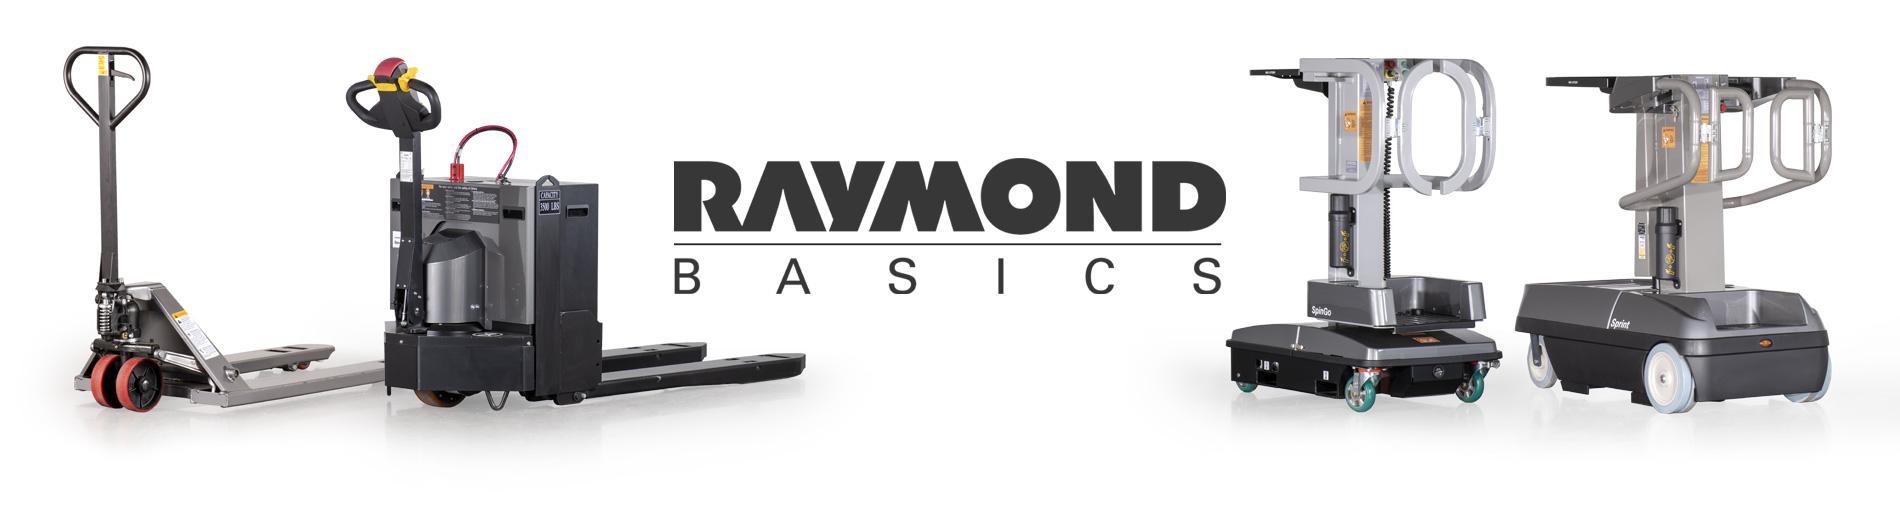 raymond basics, warehouse essentials